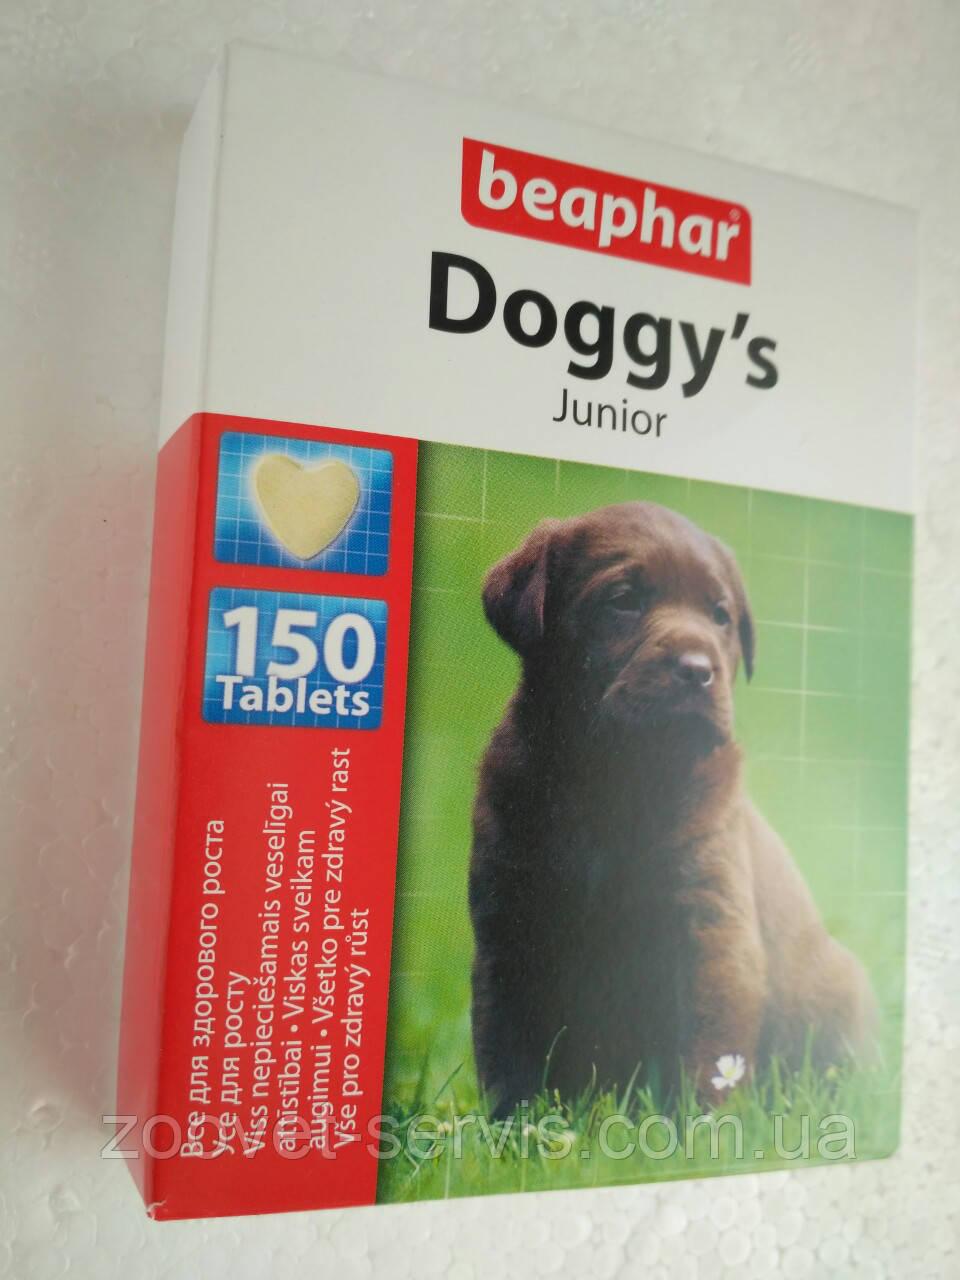 Витаминыдля щенков Беафар(Beaphar) Догис Юниор упаковка -150 таблеток